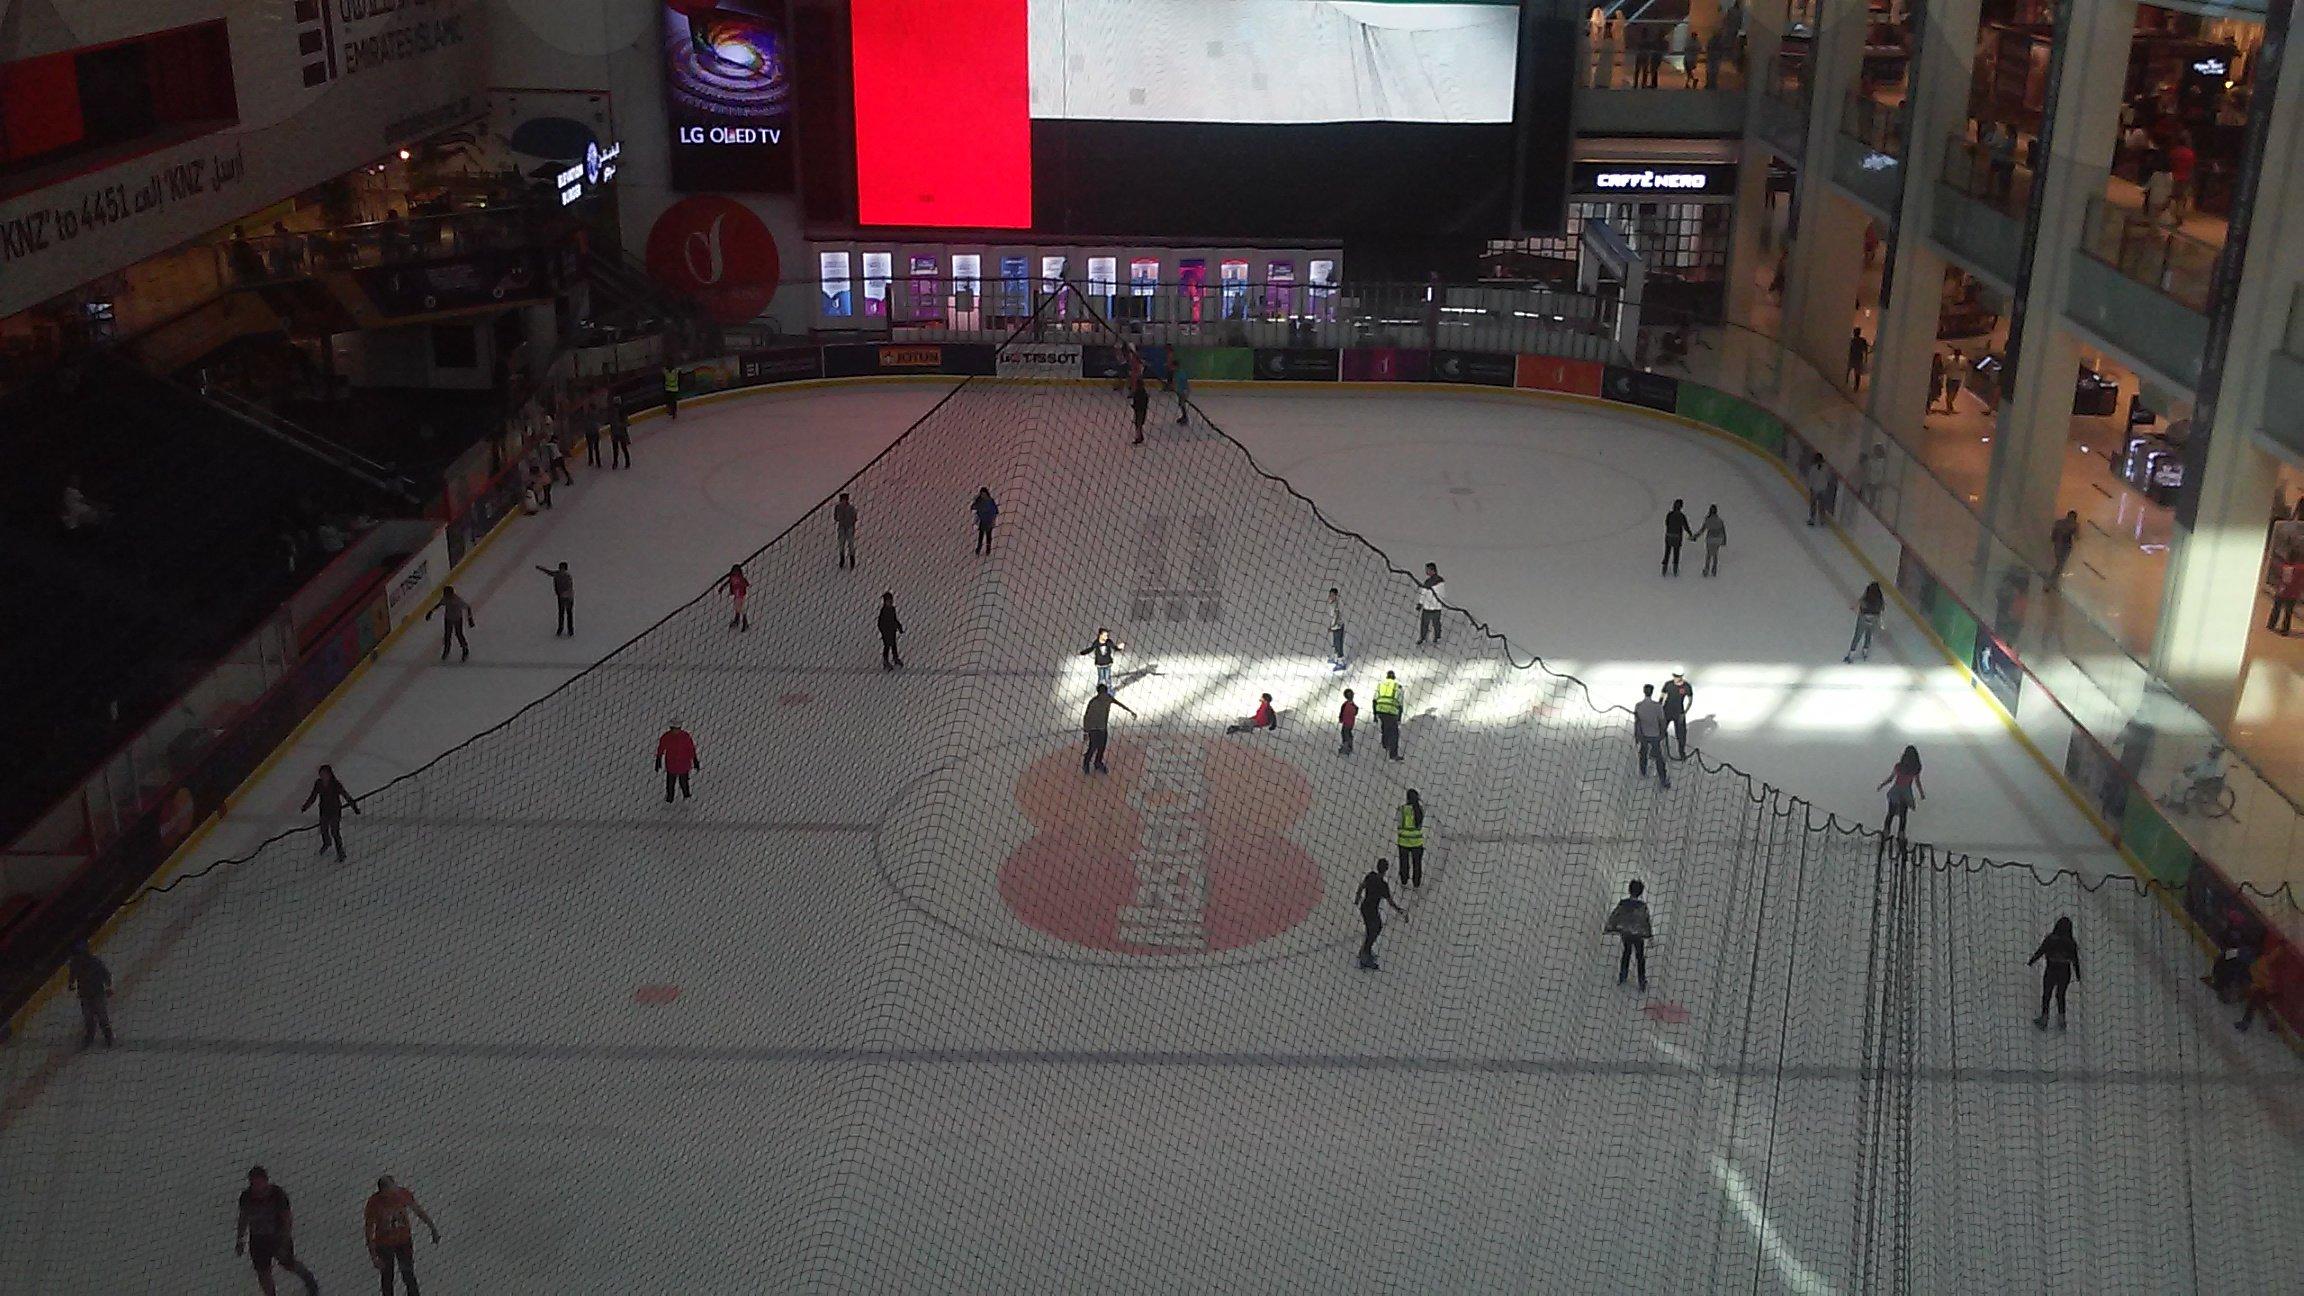 One Day in Dubai: Skating Rink in Dubai Mall